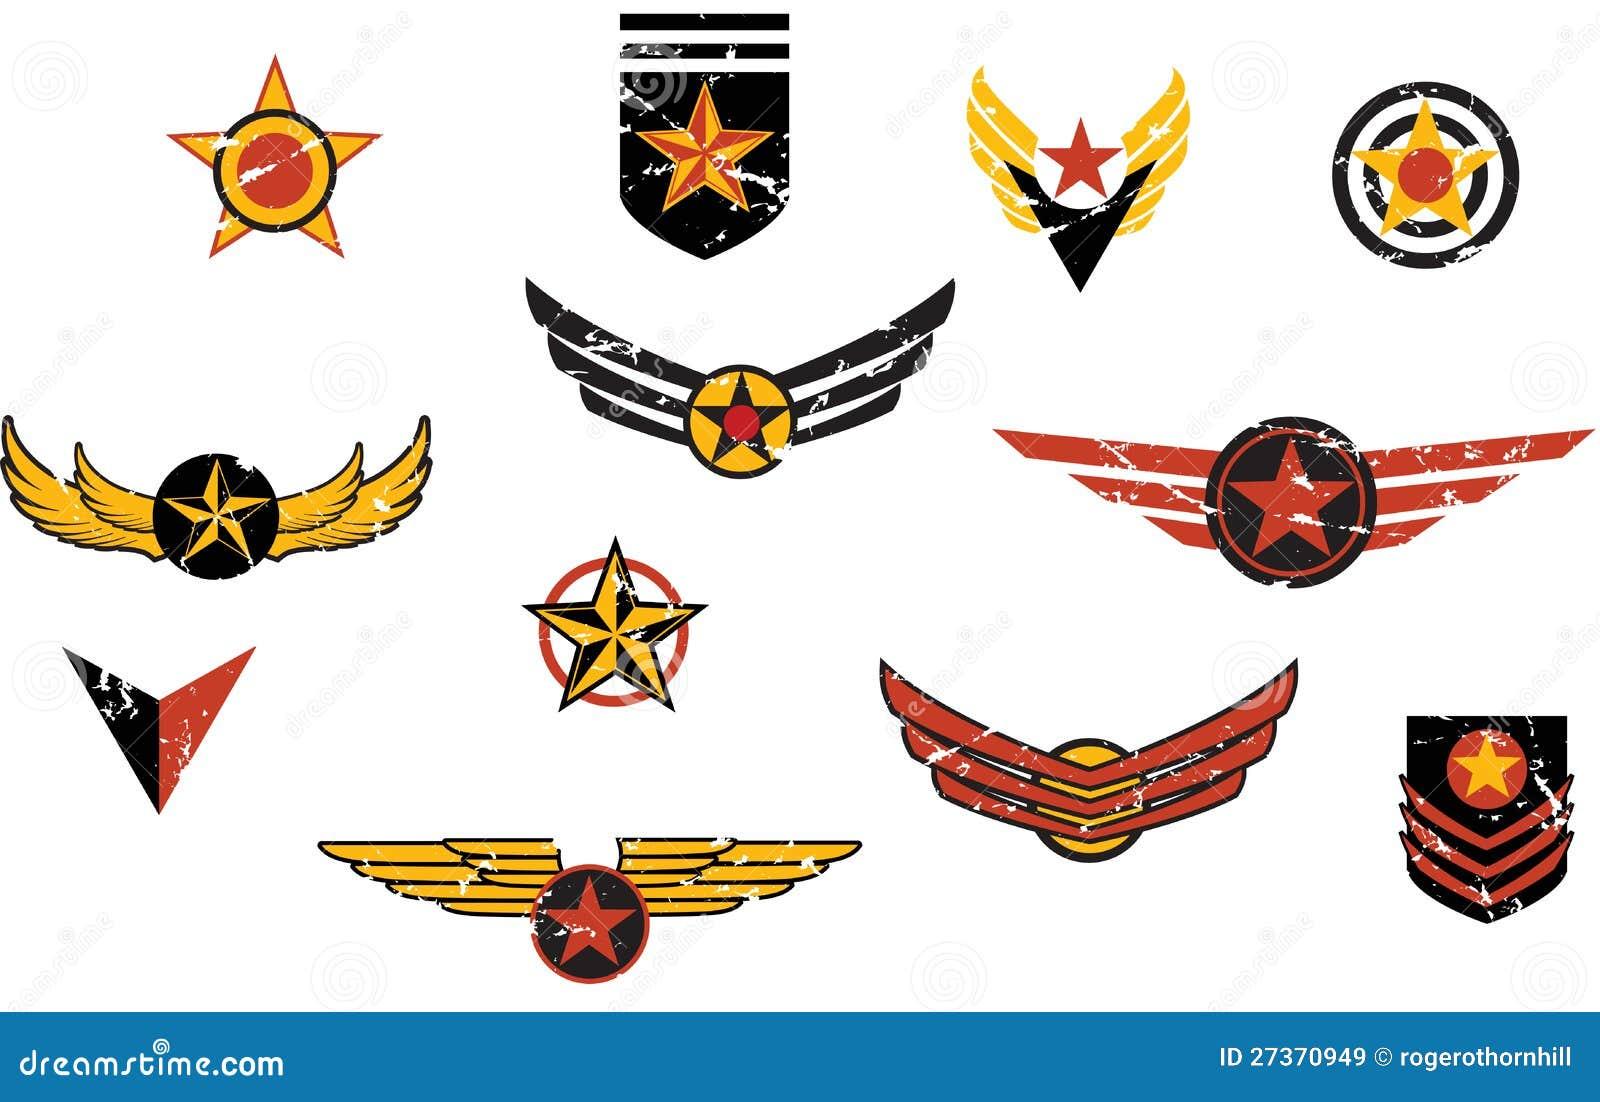 Fictional military emblems stripes